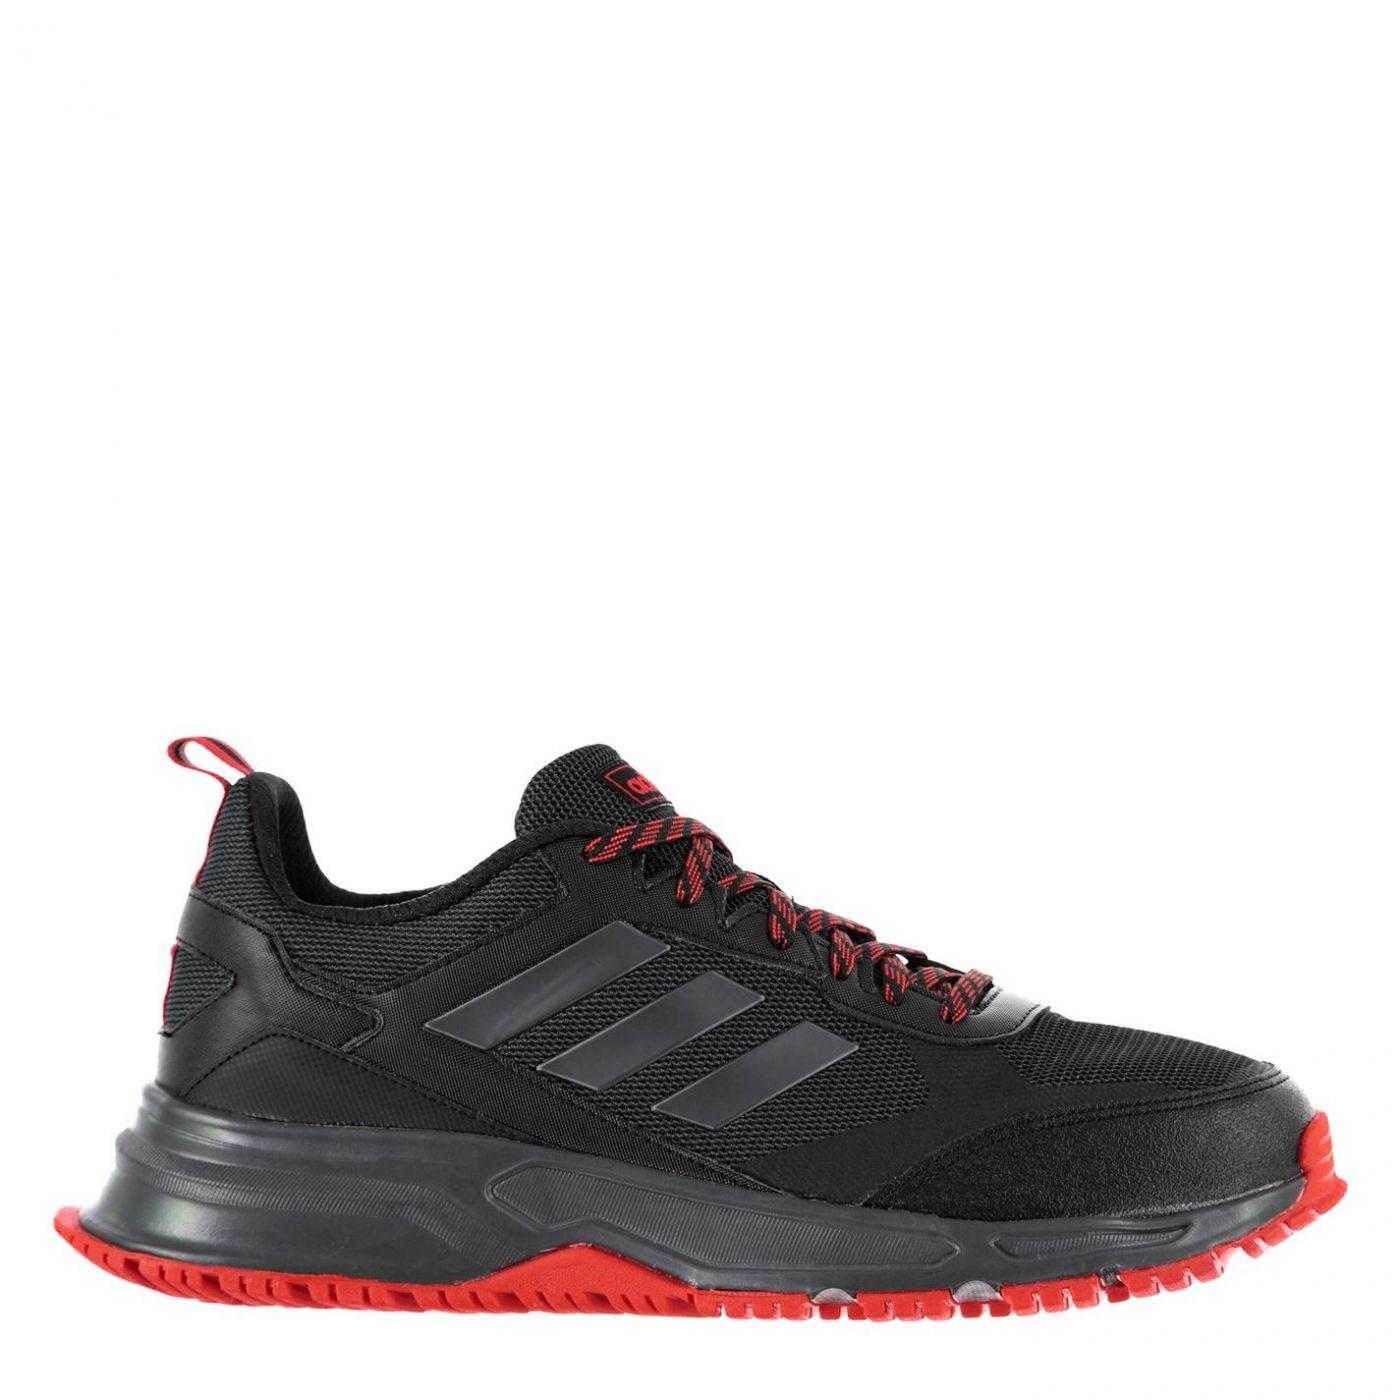 Adidas Rockadia 3 Trail Running Shoes Mens